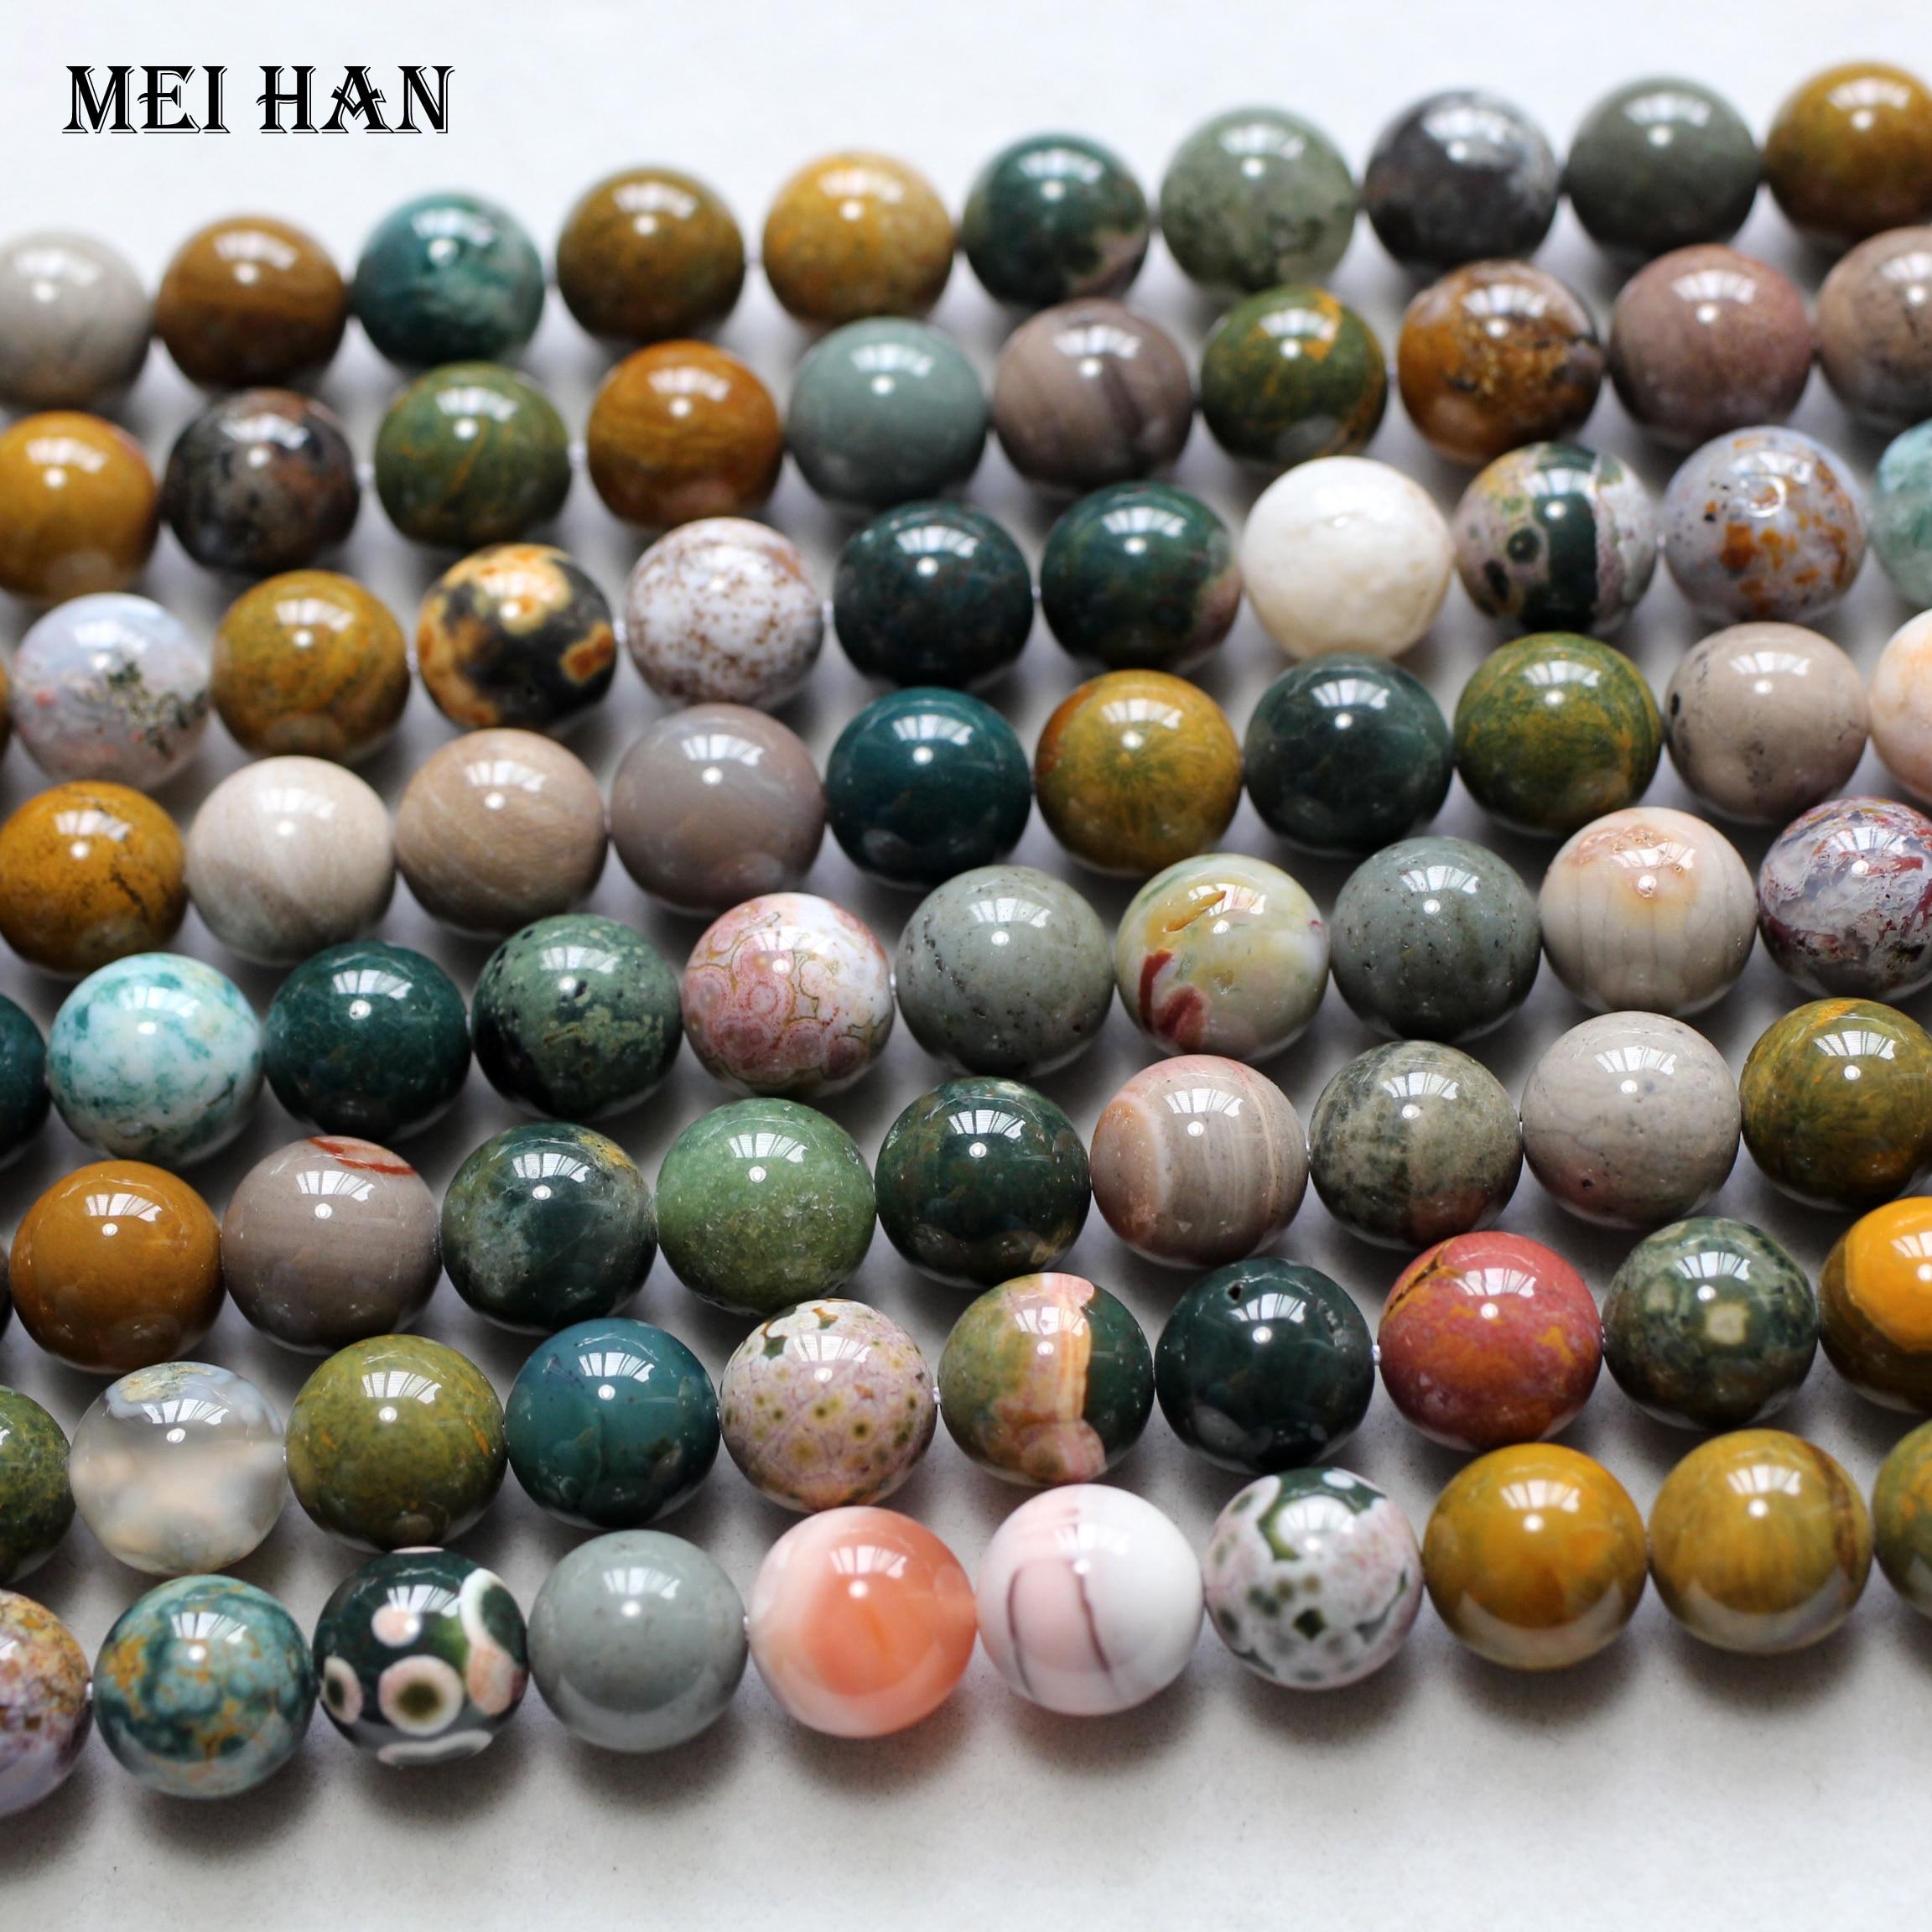 Leopardskin Jasper Round Beads 6mm Mixed 60 Pcs Gemstones DIY Jewellery Making